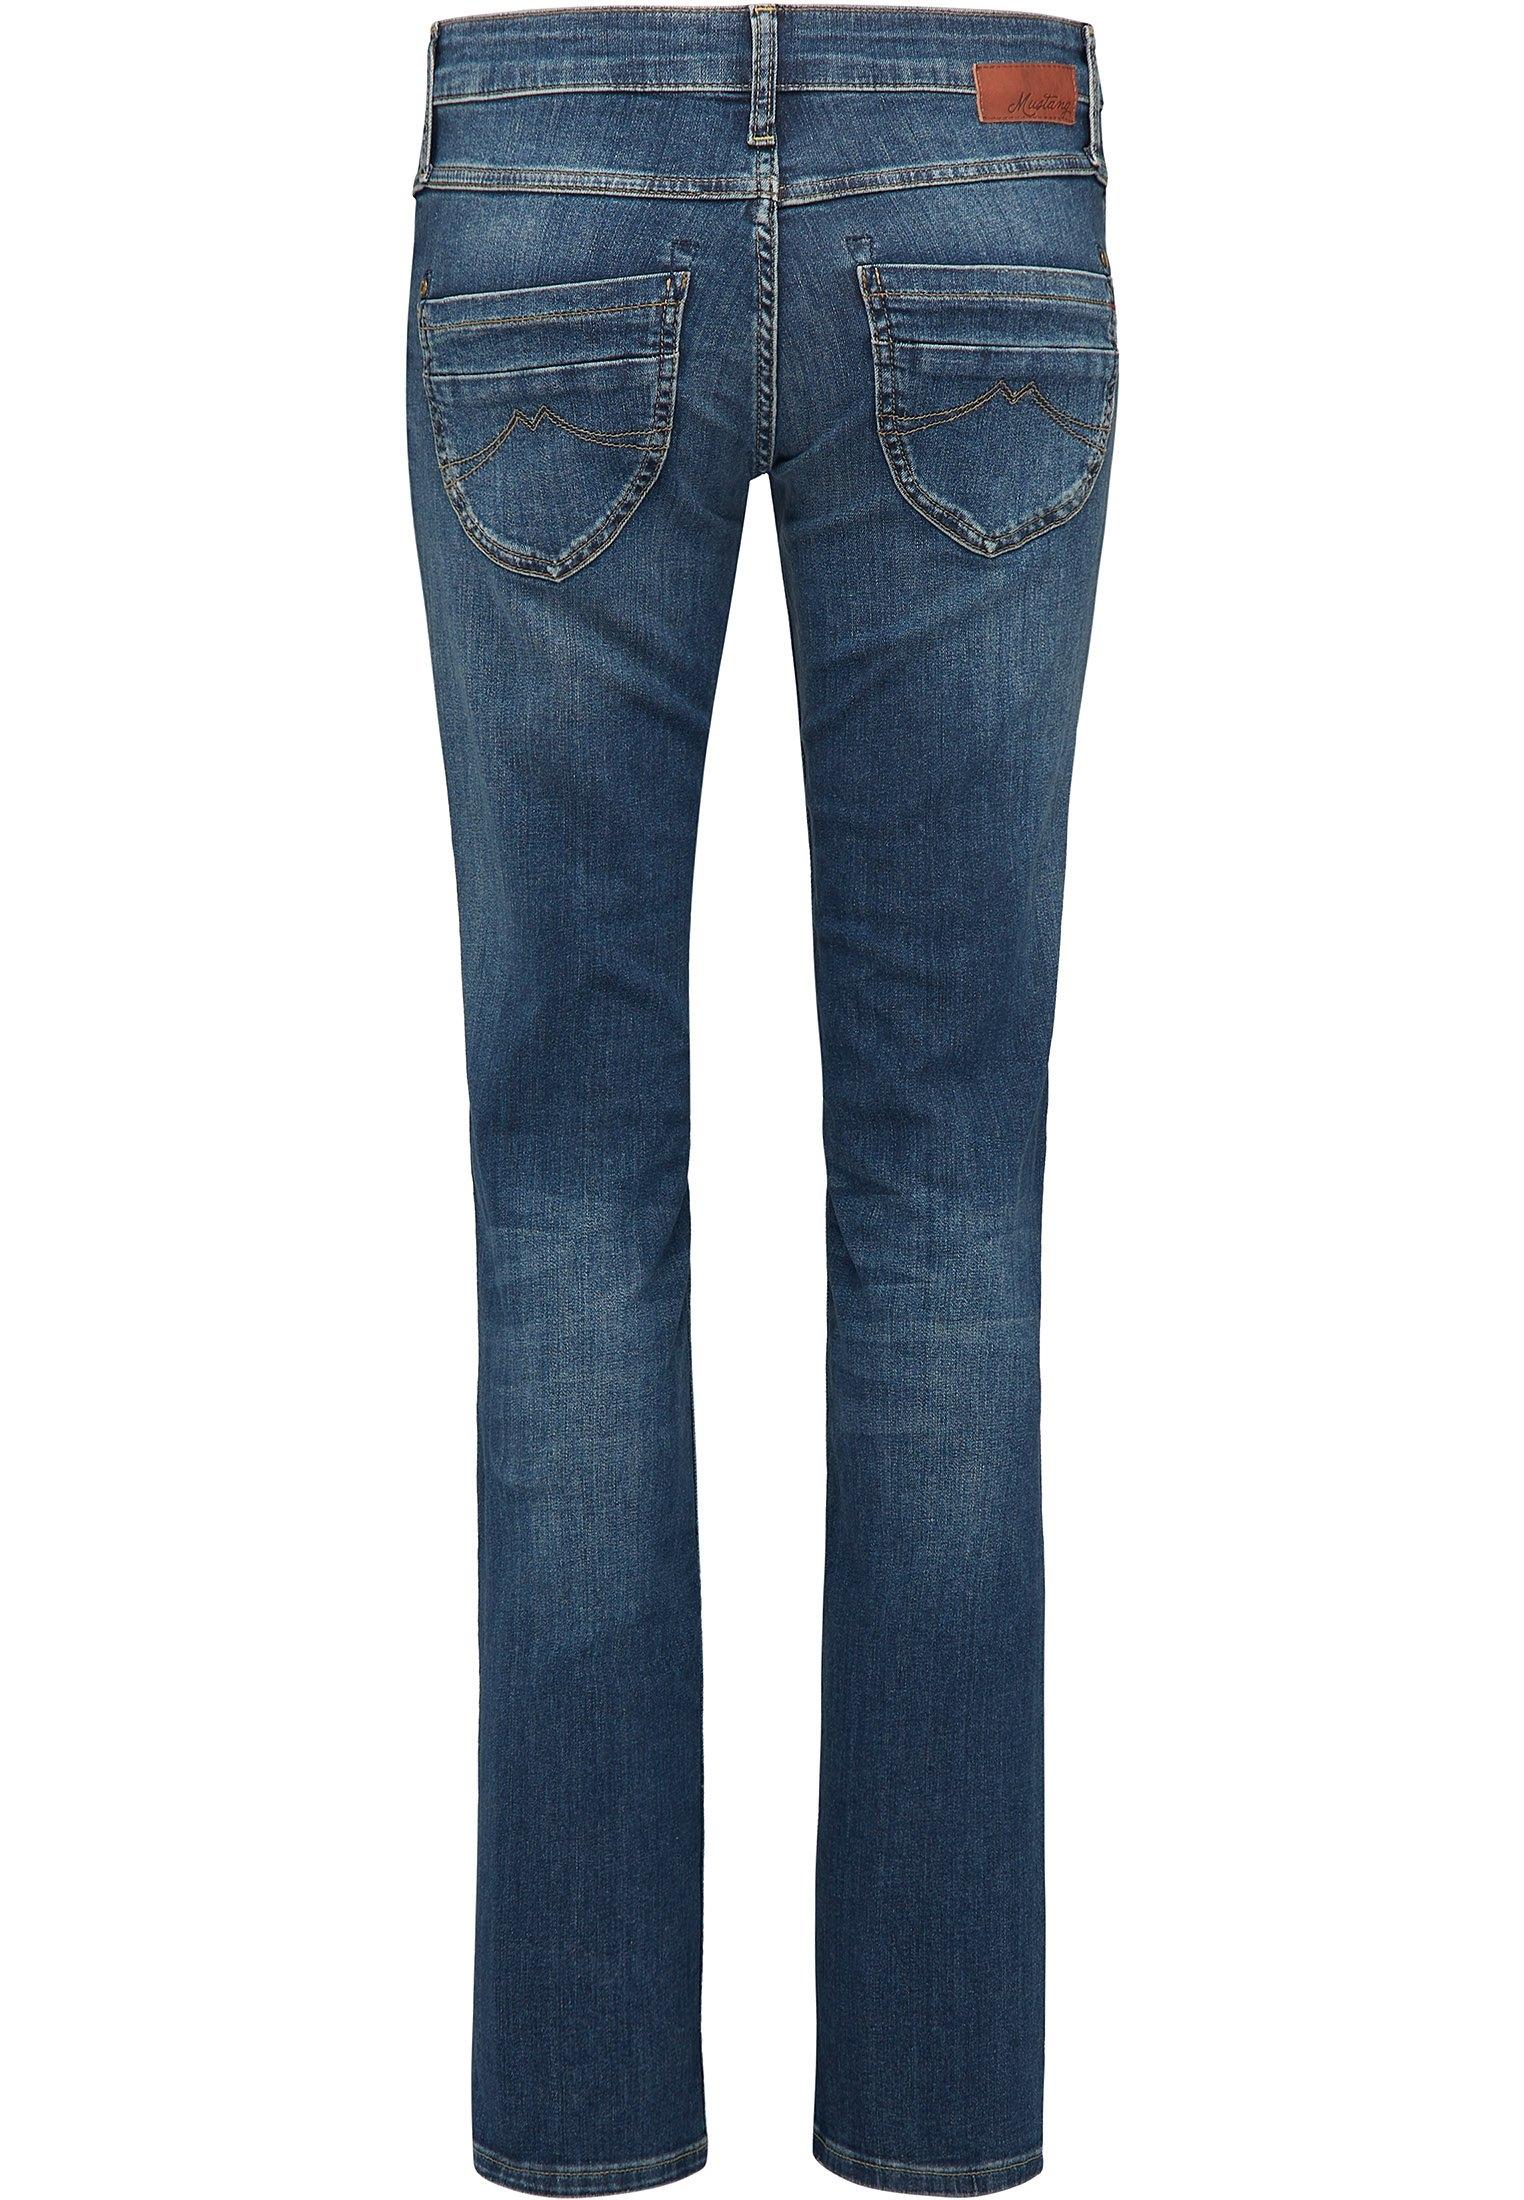 MUSTANG straight jeans Sissy Straight voordelig en veilig online kopen